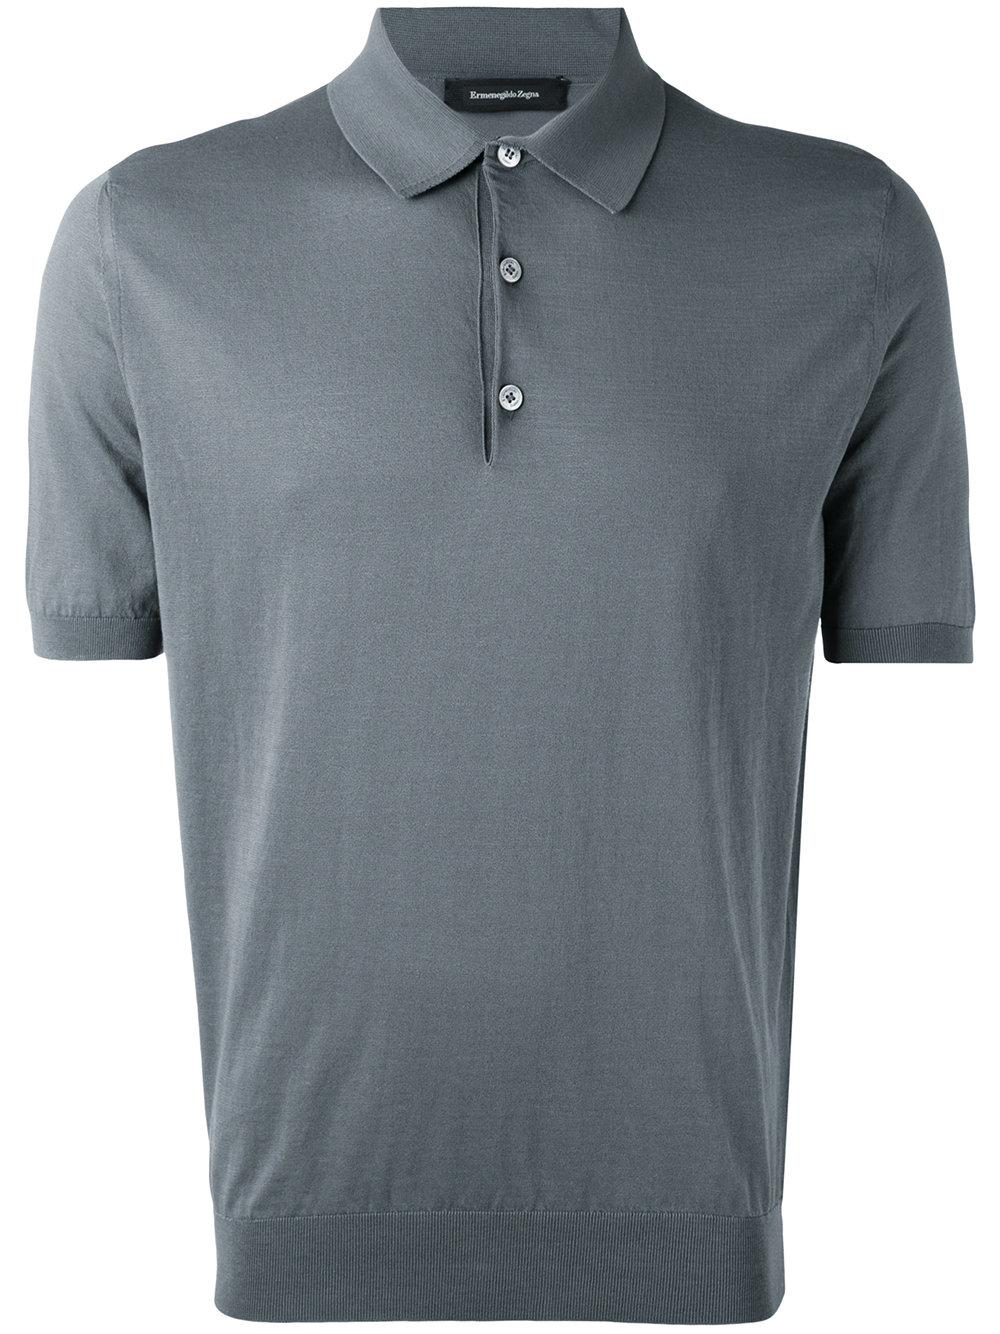 Lyst ermenegildo zegna classic polo top in gray for men for Zegna polo shirts sale